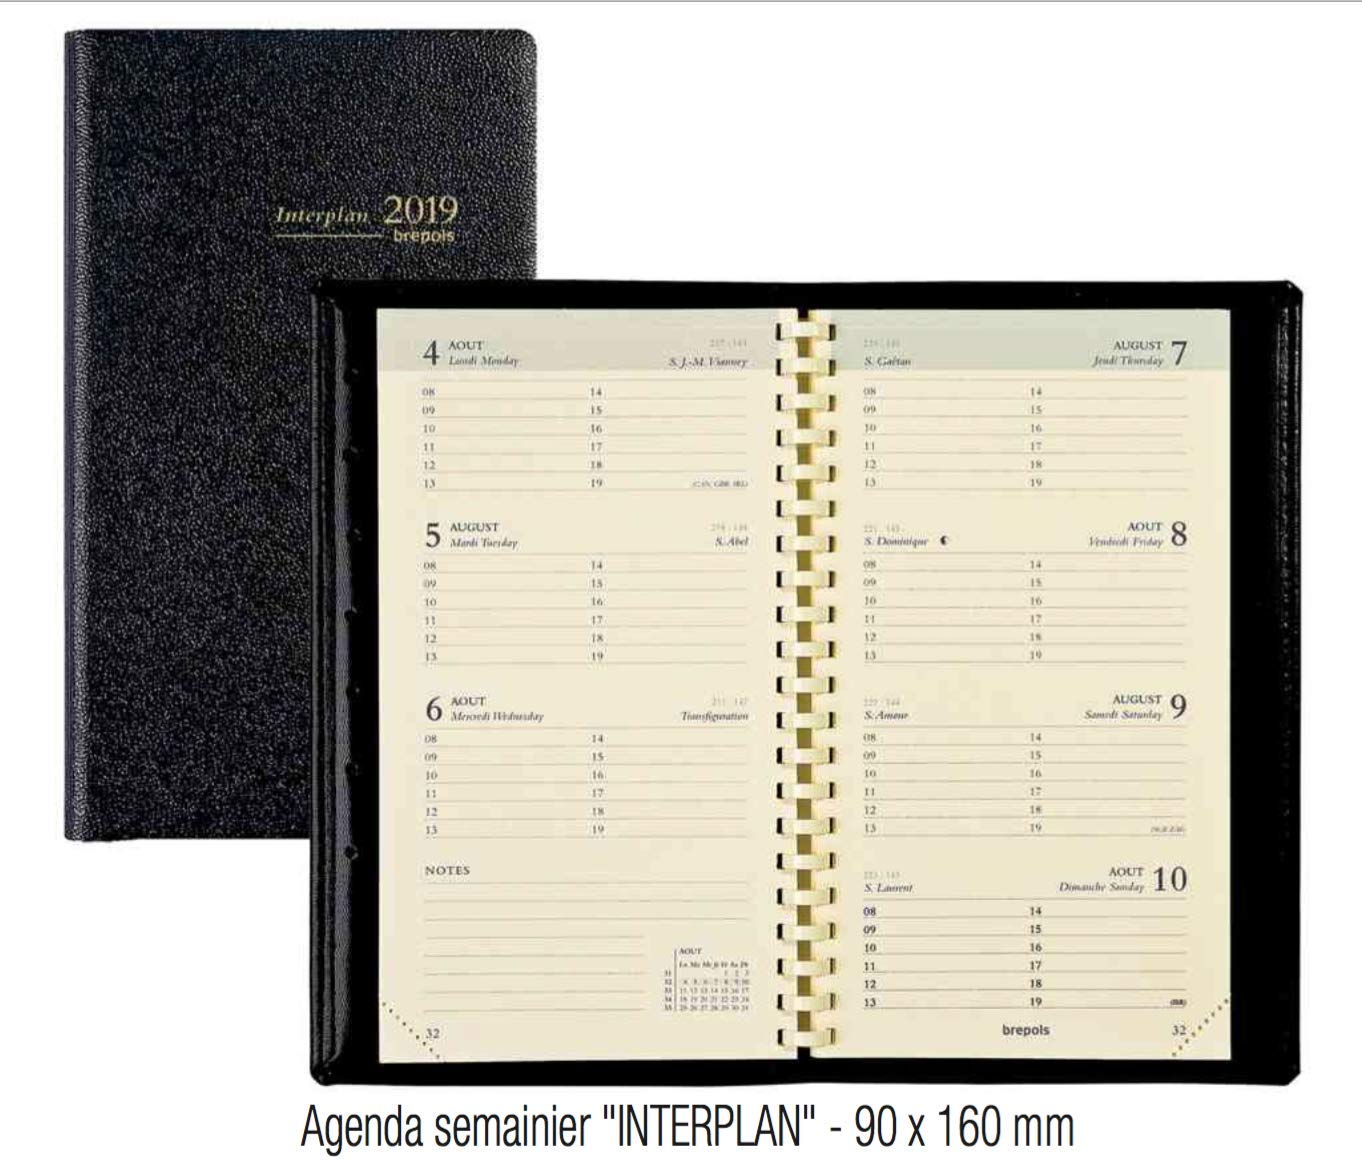 Brepols Agenda semainier INTERPLAN 2019 - Couverture : Noir - Format : 90 x 160 mm BURO-FR